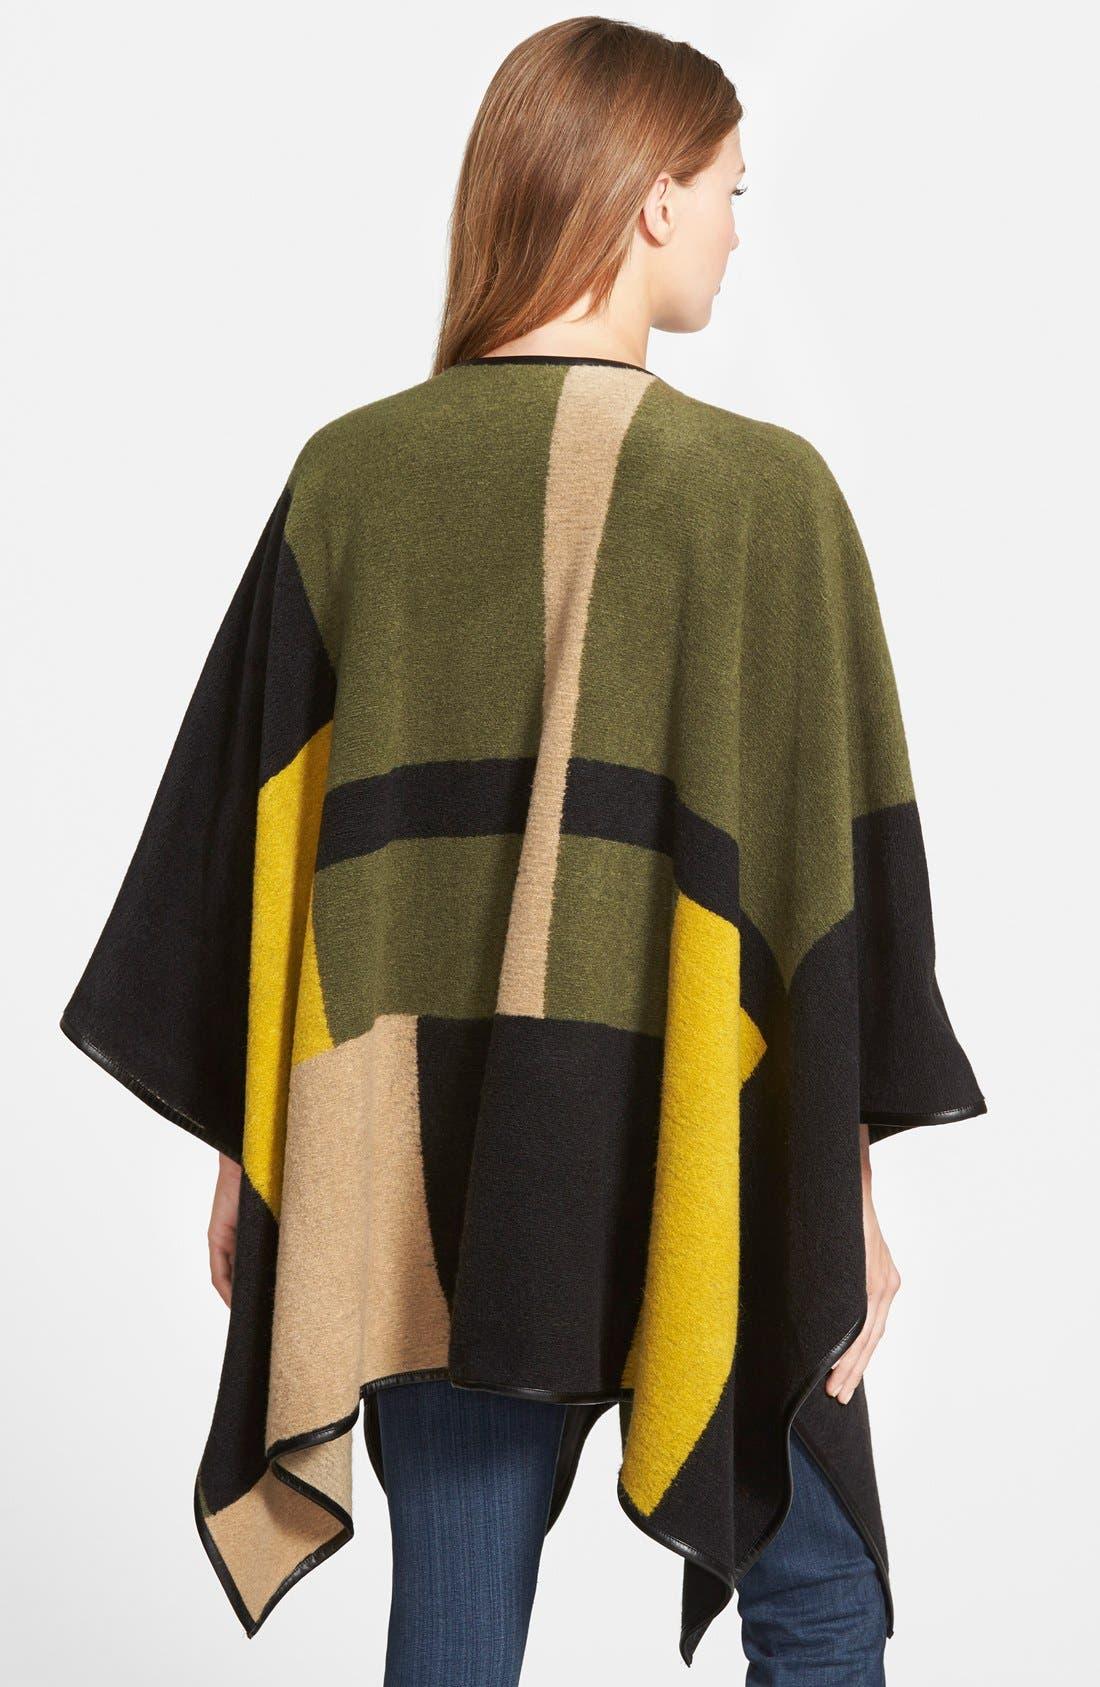 VINCE CAMUTO, Blanket Jacquard Poncho, Alternate thumbnail 2, color, 342